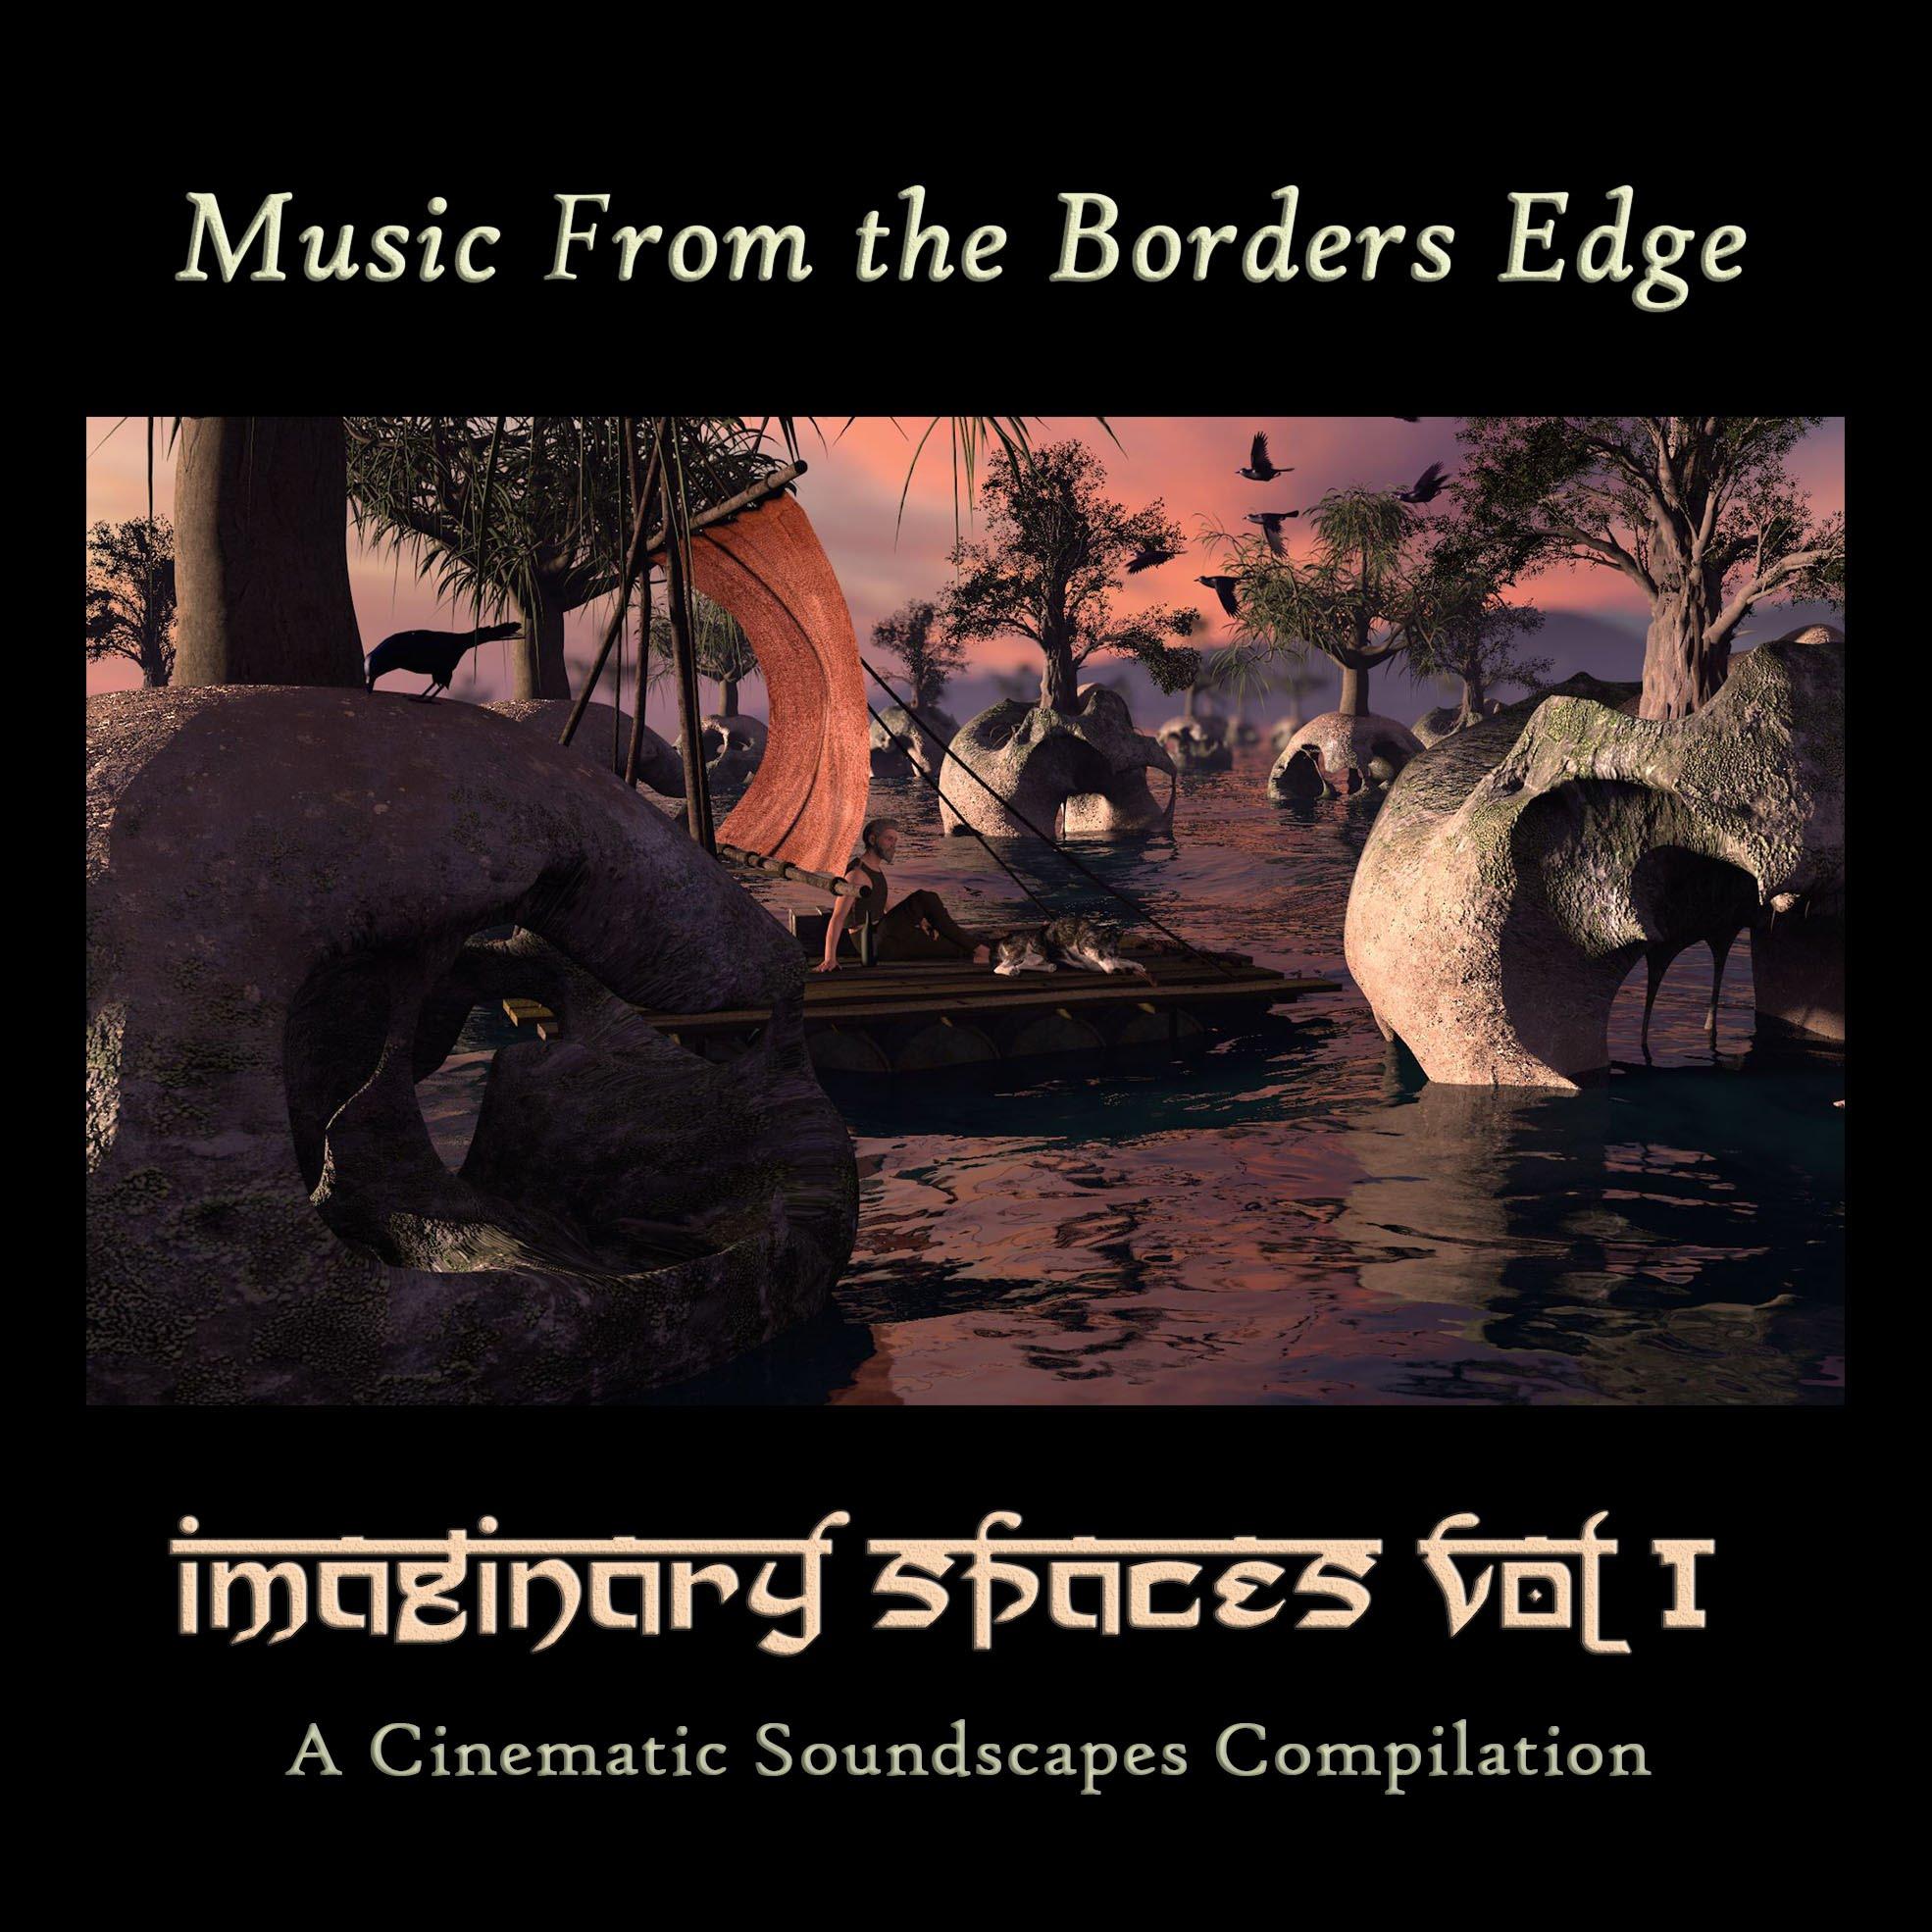 https://bordersedge.bandcamp.com/album/imaginary-spaces-vol-1